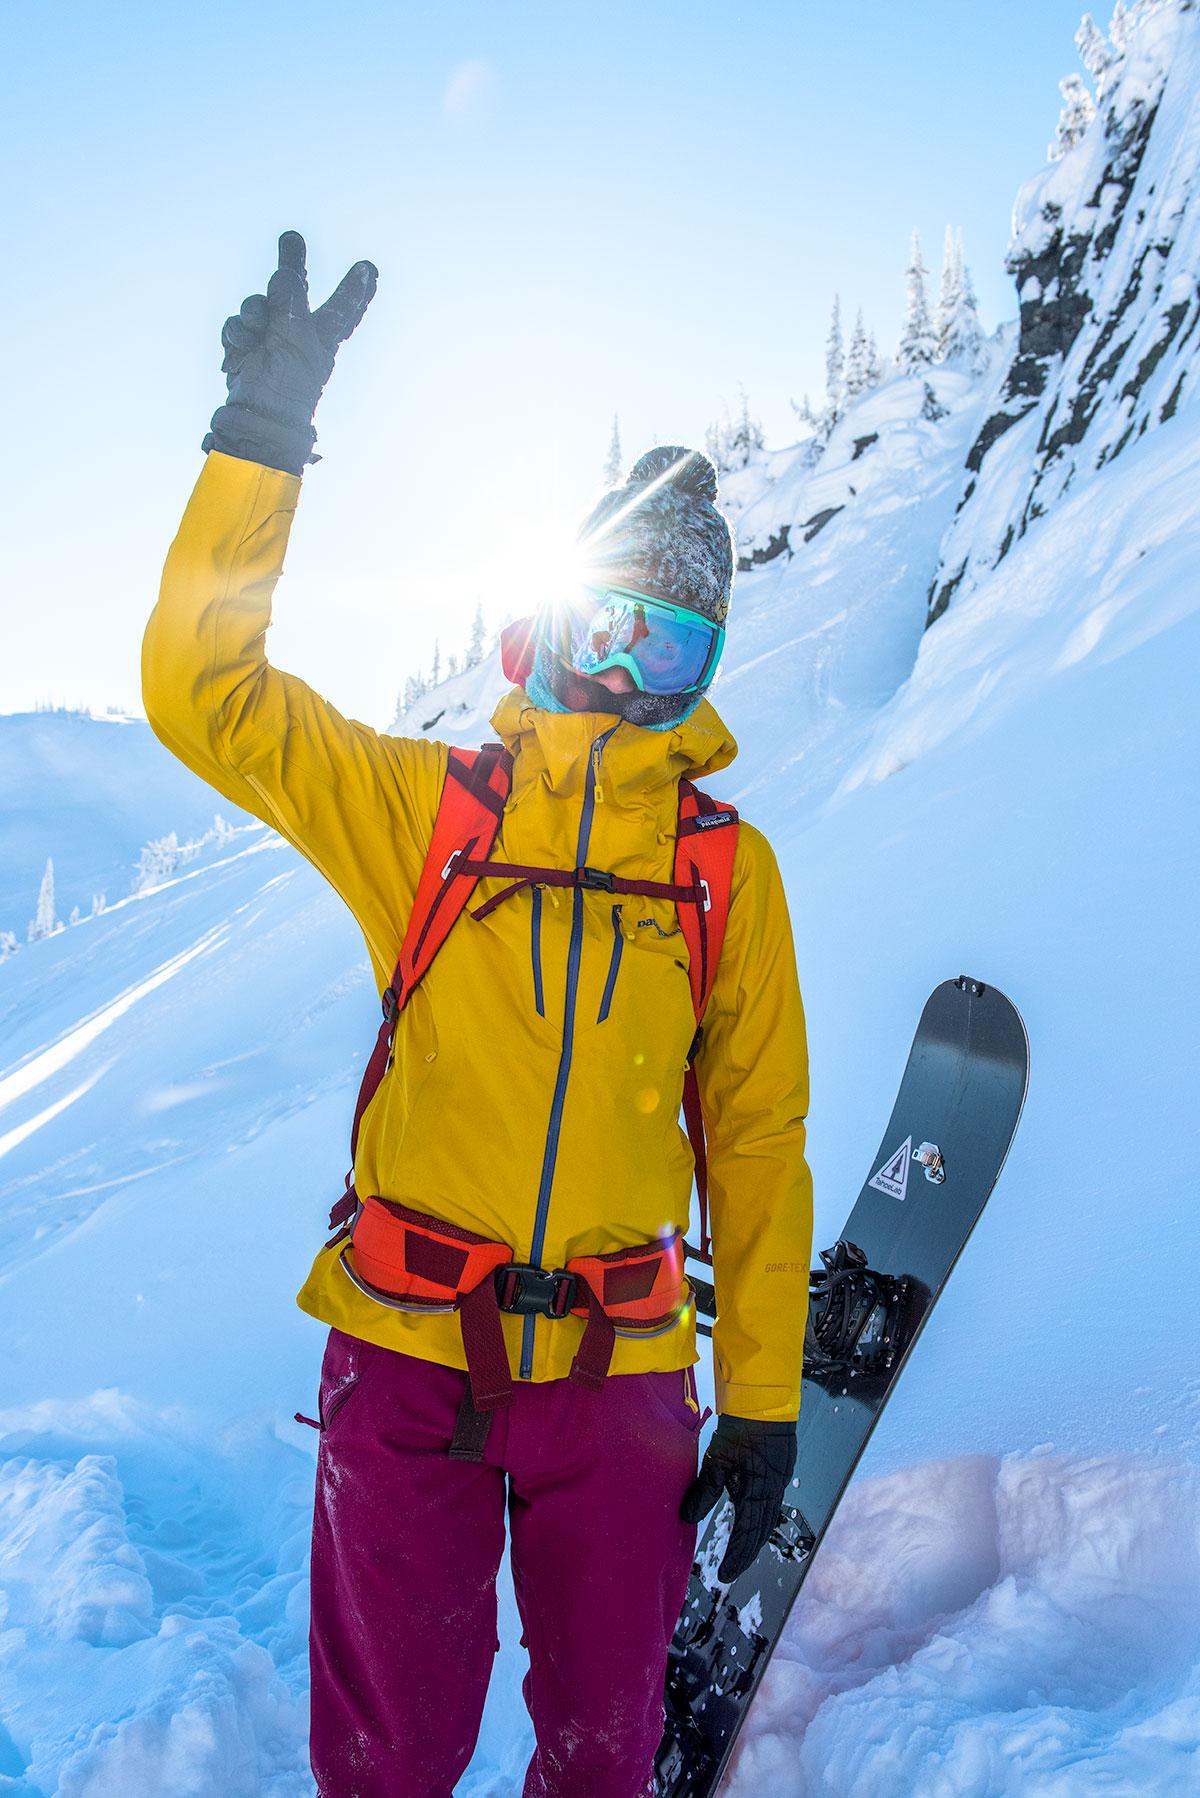 austin-trigg-patagonia-banff-alberta-winter-canada-lifestyle-adventure-mountains-rogers-pass-backountry-touring.jpg